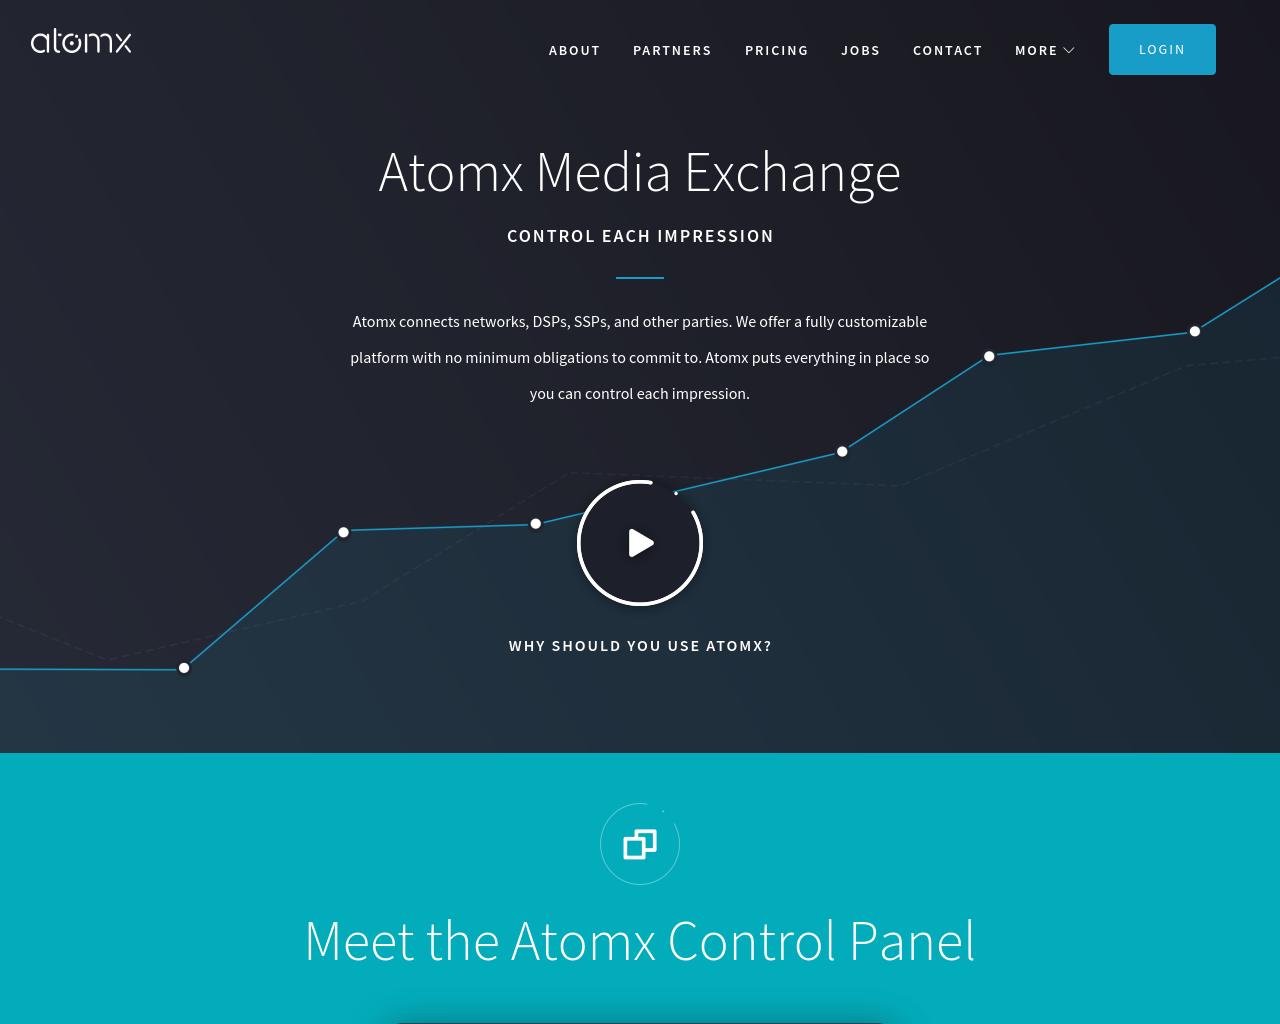 Atomx-Advertising-Reviews-Pricing